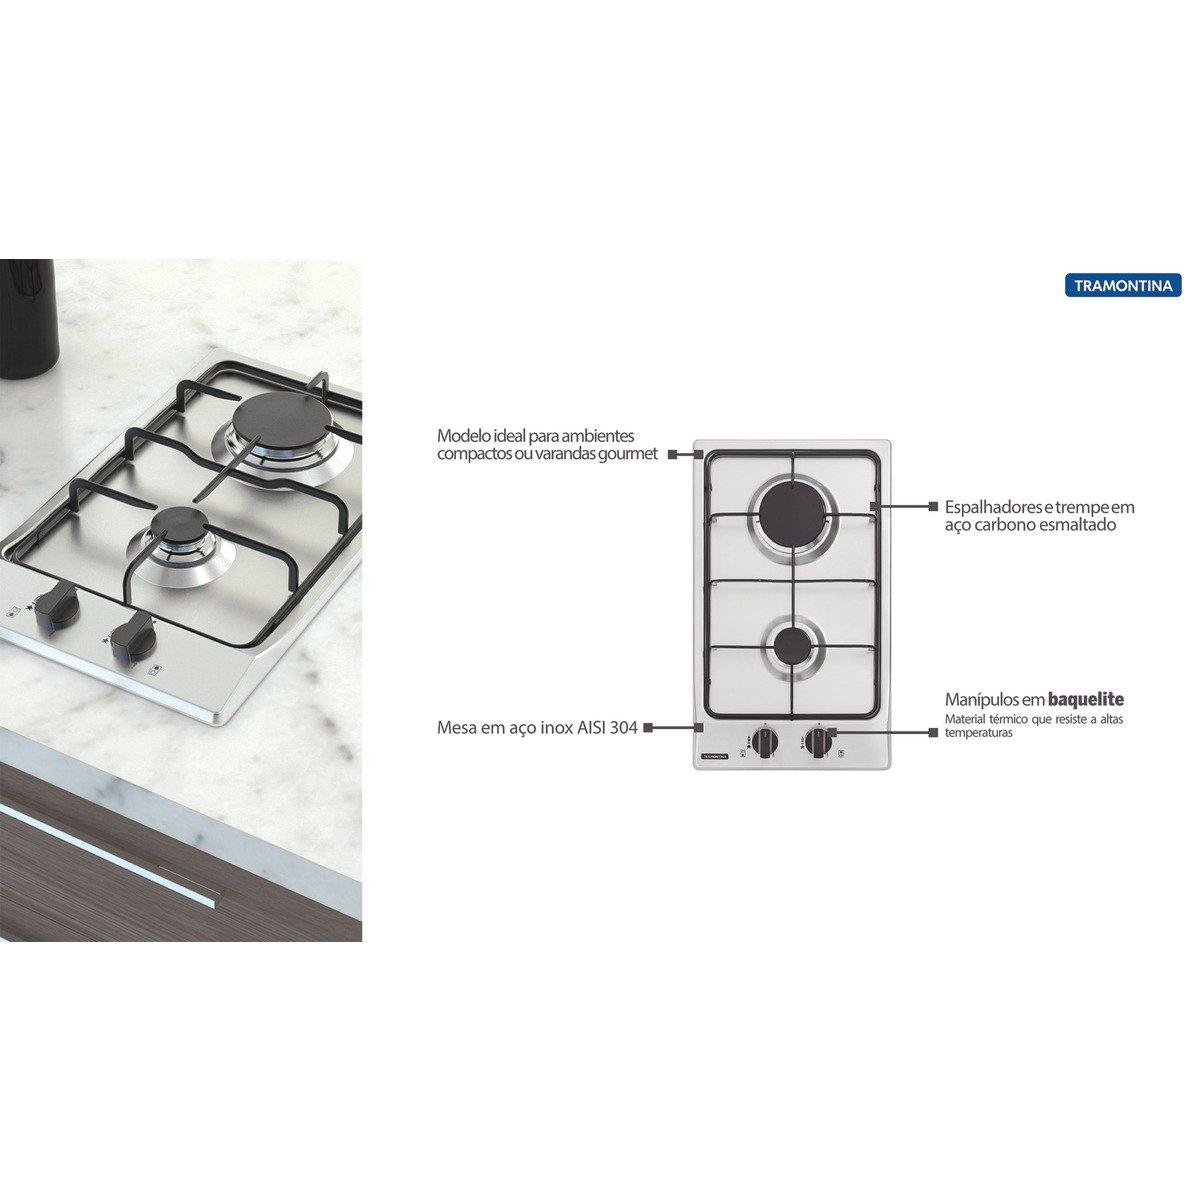 Cooktop a Gás Tramontina Dominó 2GX 30 em Aço Inox 2 Queimadores